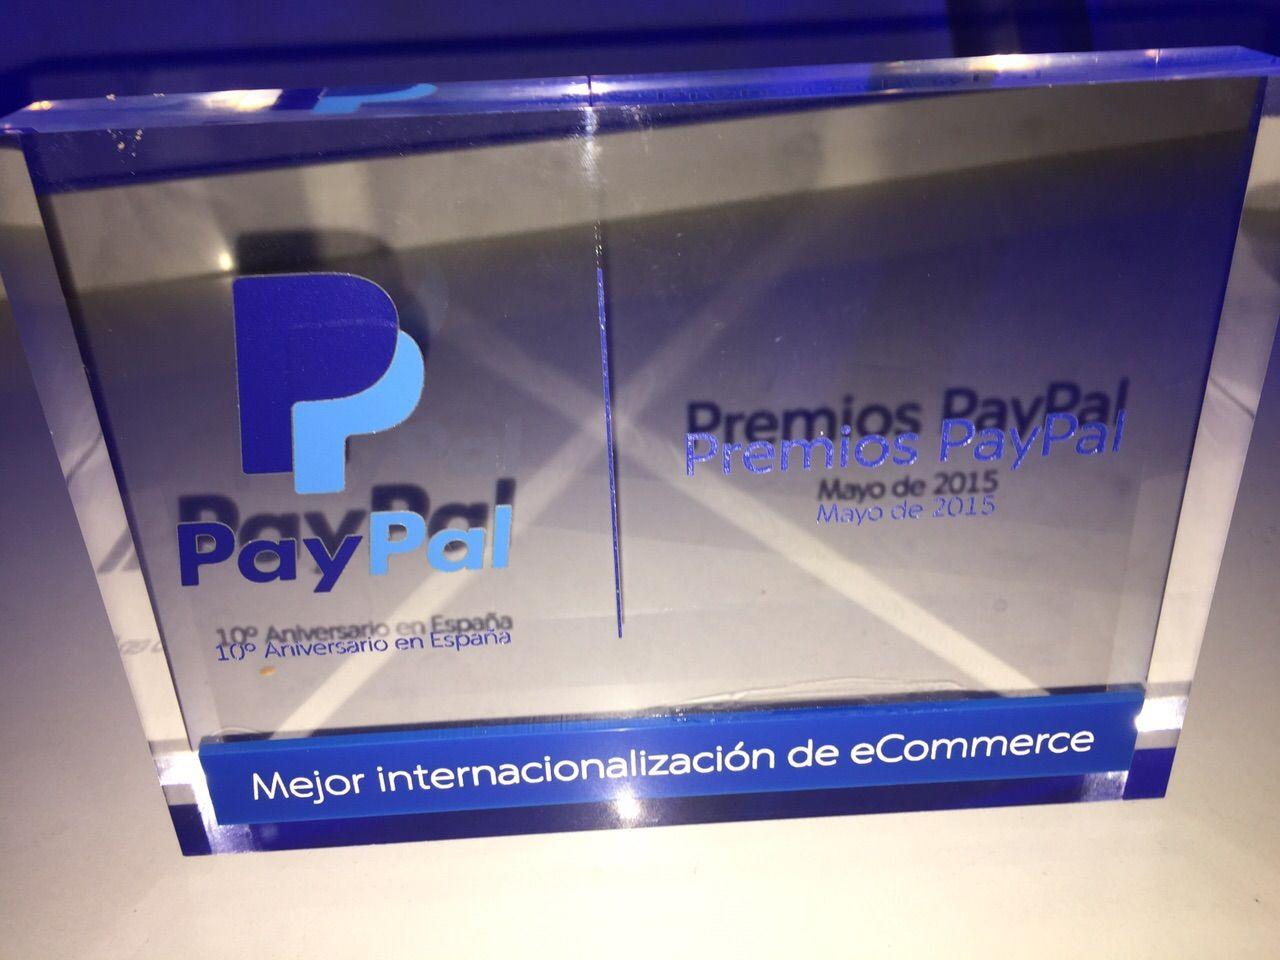 PayPal Award, Pisamonas wins the Best International Spanish